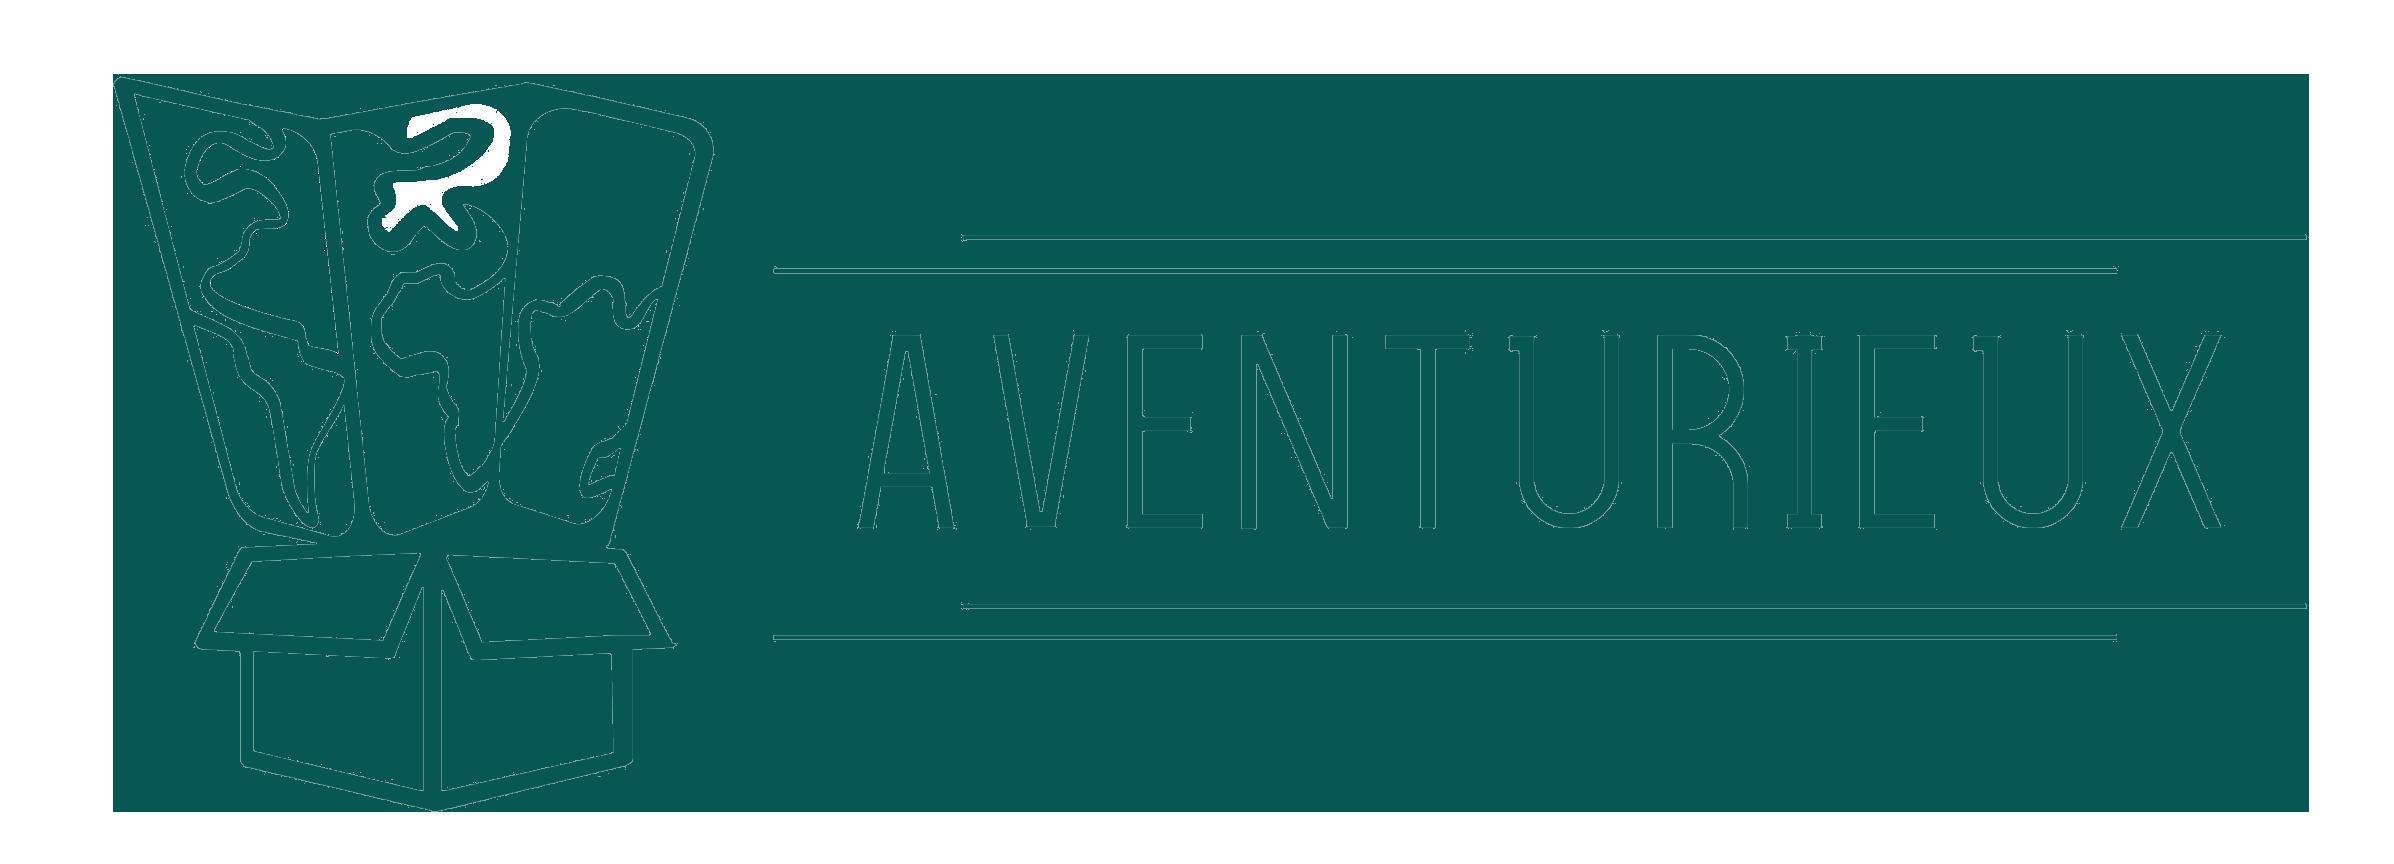 Aventurieux